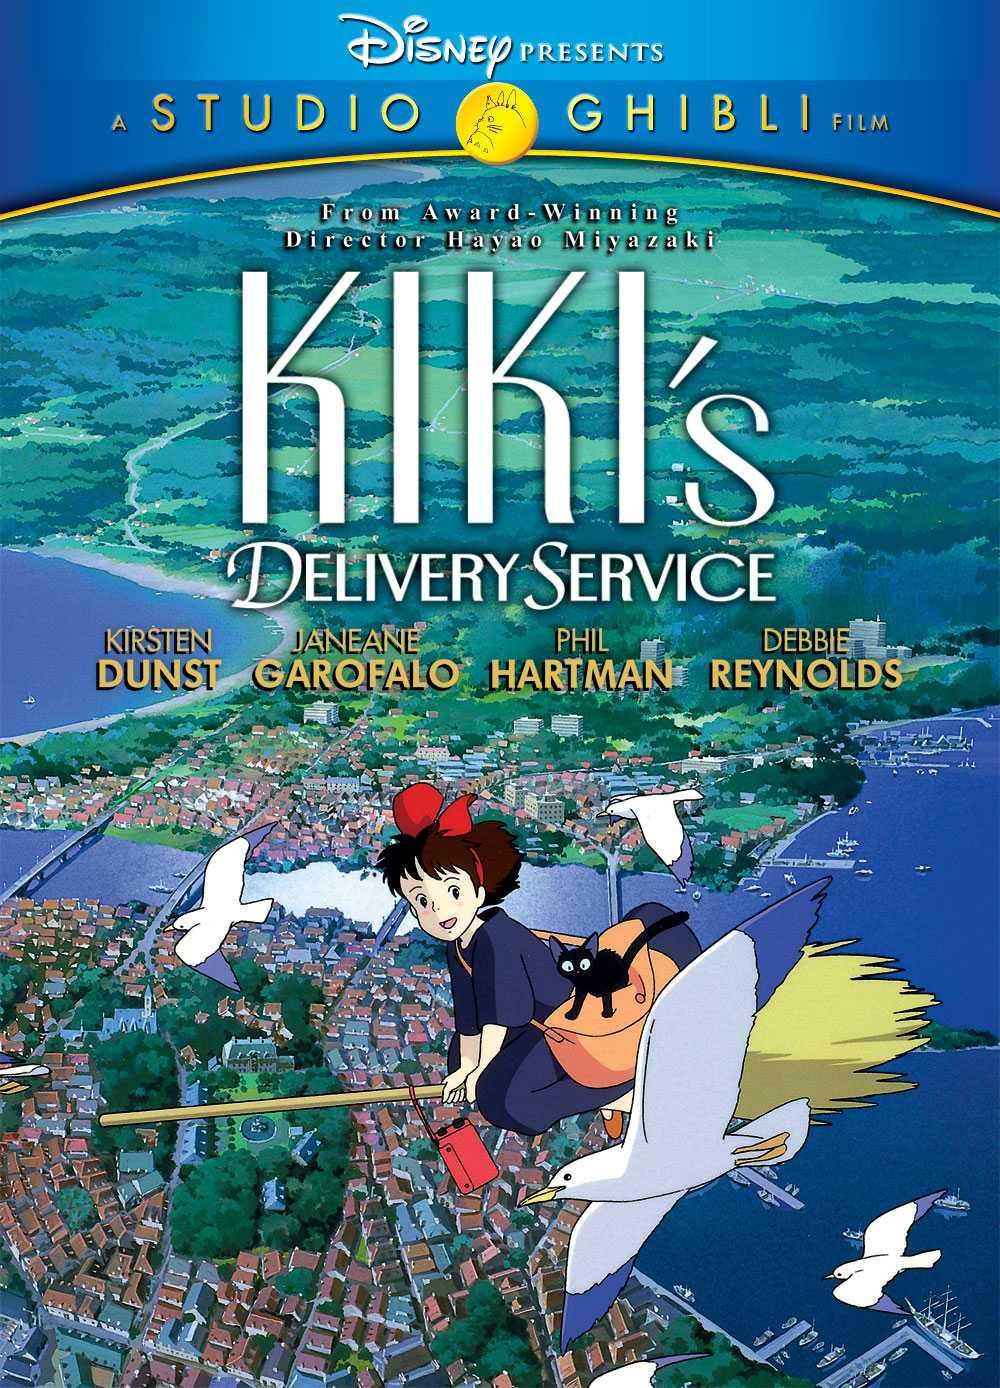 Photo courtesy of www.movies.disney.com/kikis-delivery-service.